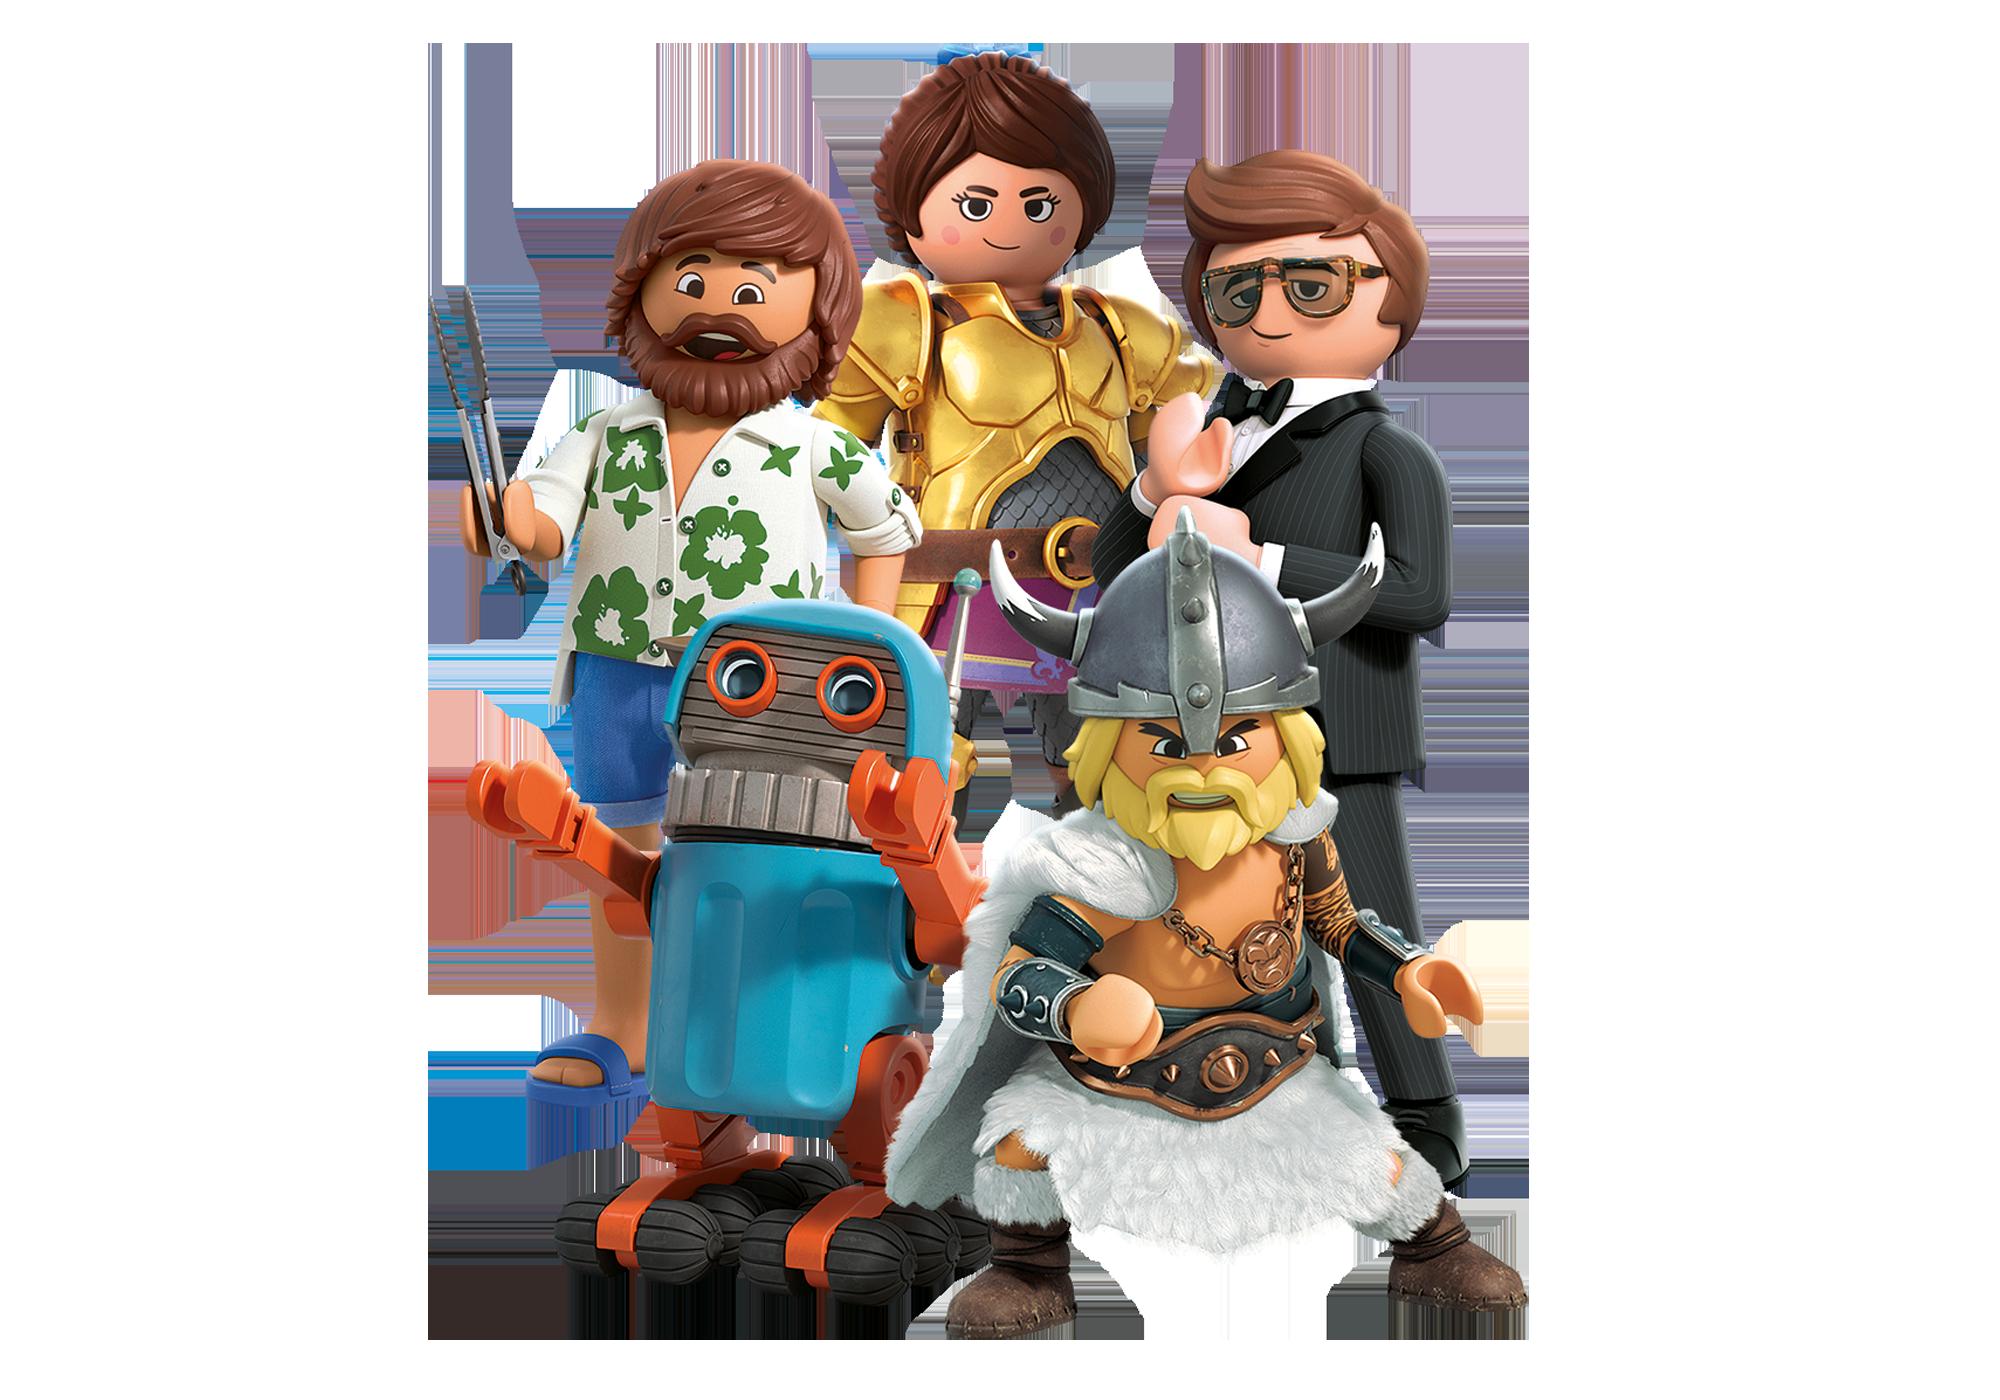 http://media.playmobil.com/i/playmobil/70069_product_detail/PLAYMOBIL:THE MOVIE Figures (Serie 1)